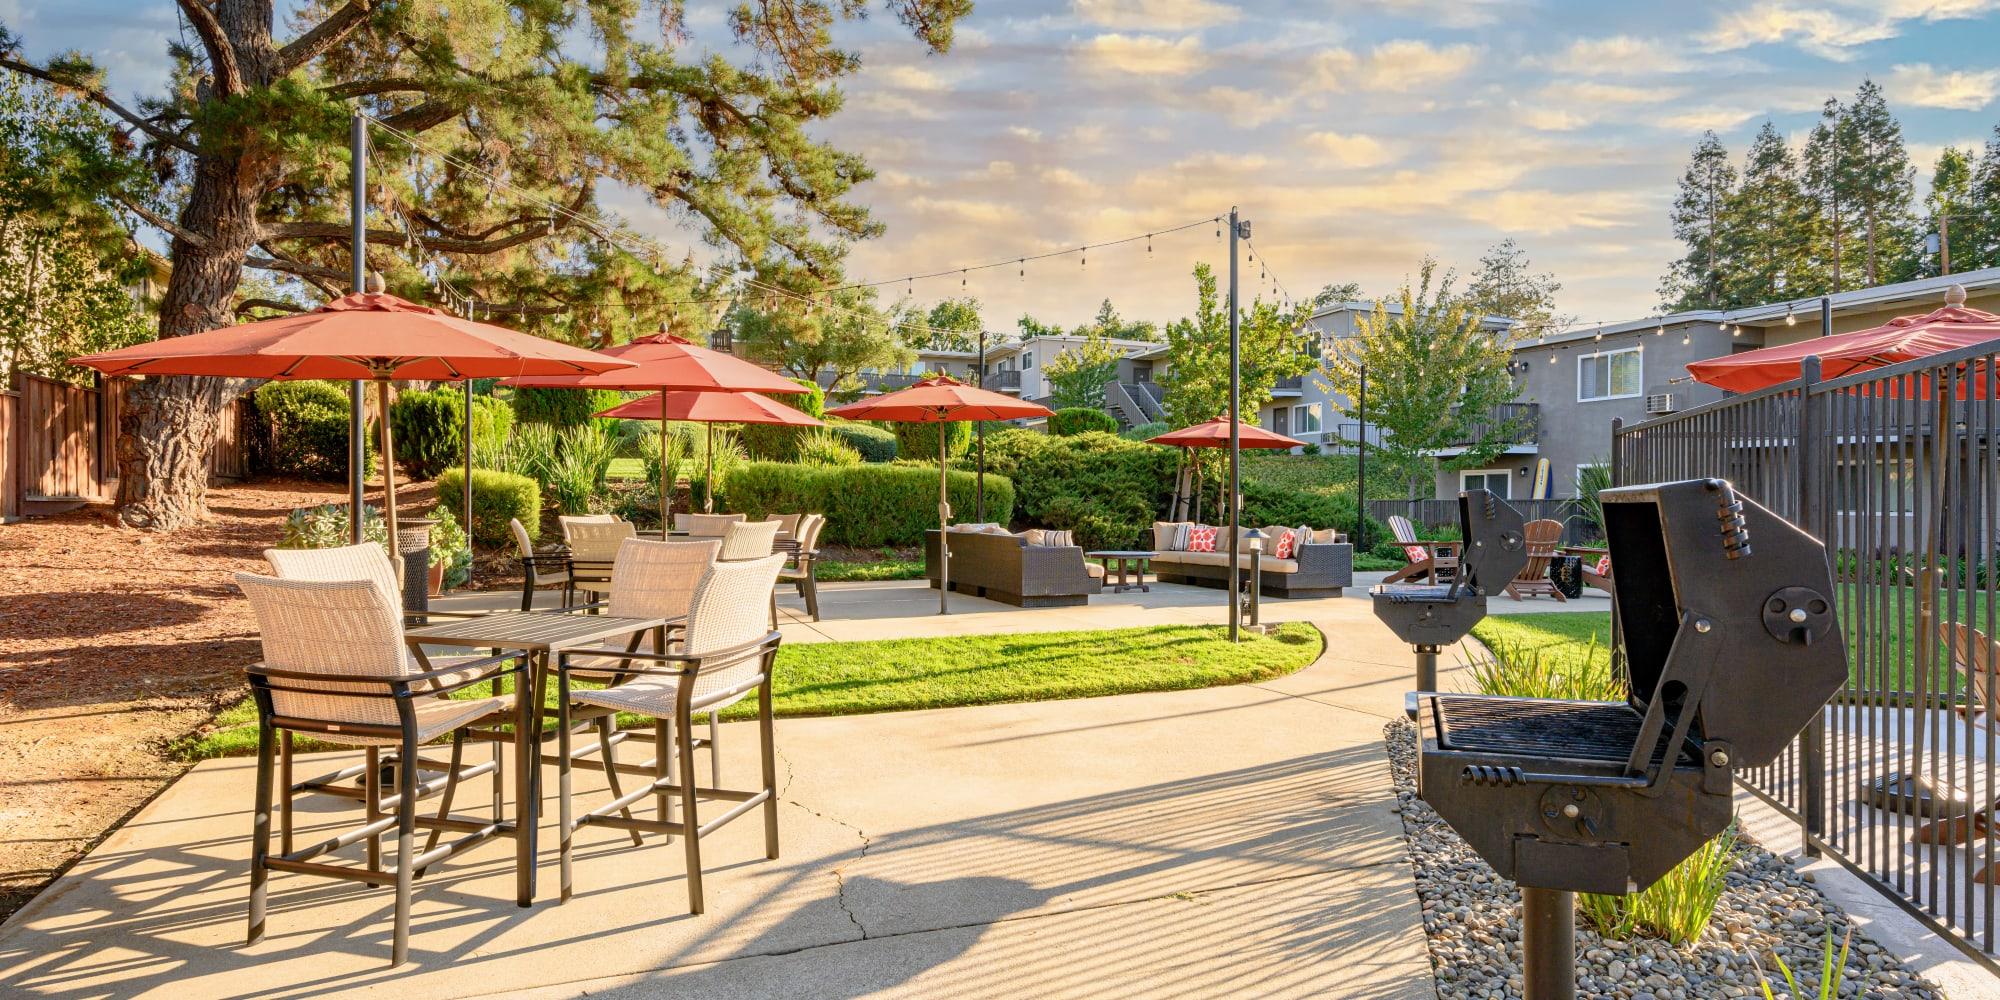 Mature trees providing shade at the barbecue lounge area at Pleasanton Heights in Pleasanton, California